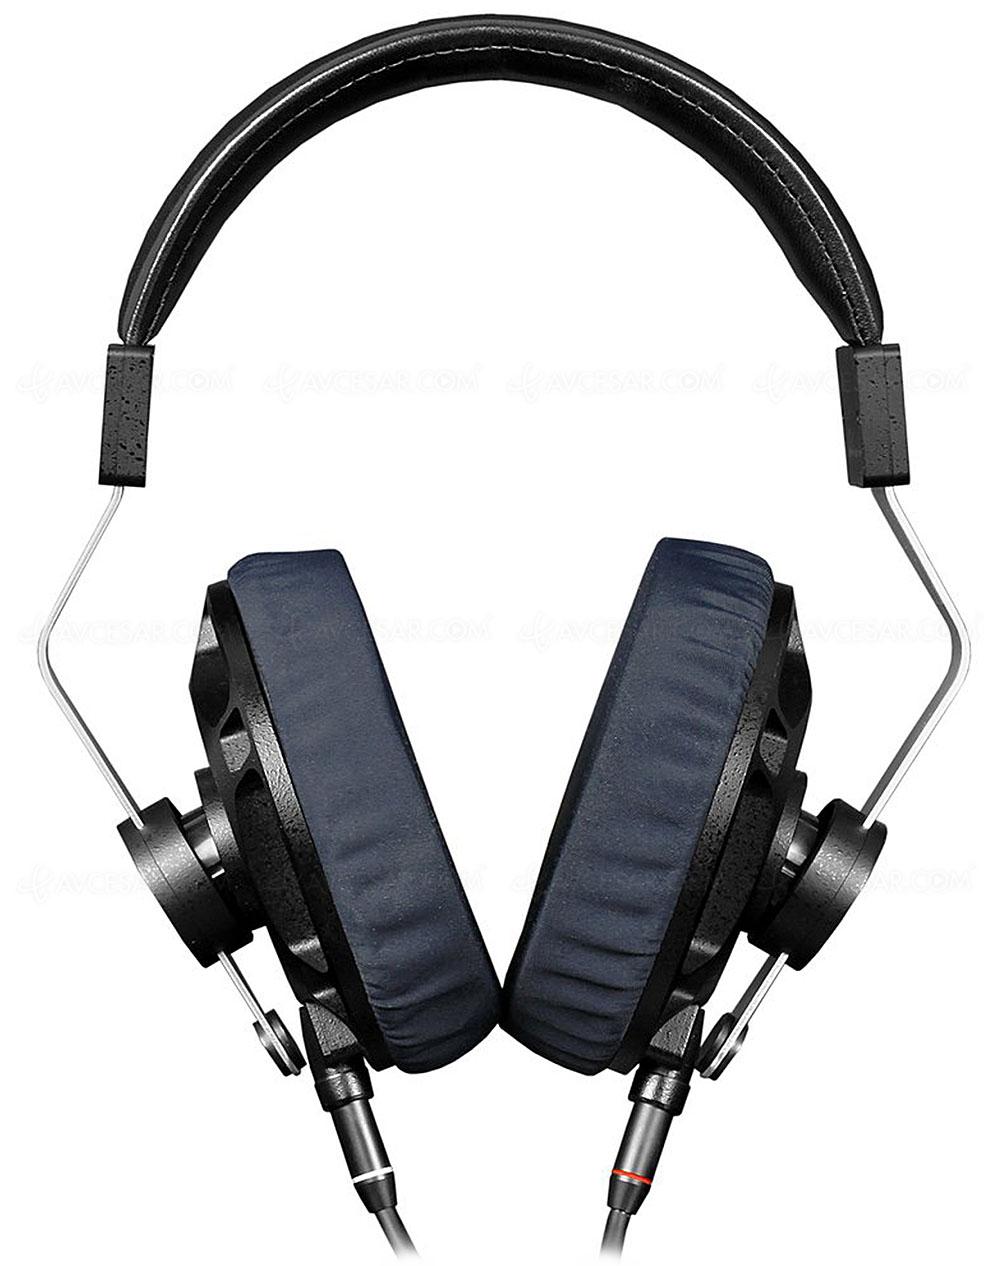 test final audio d8000